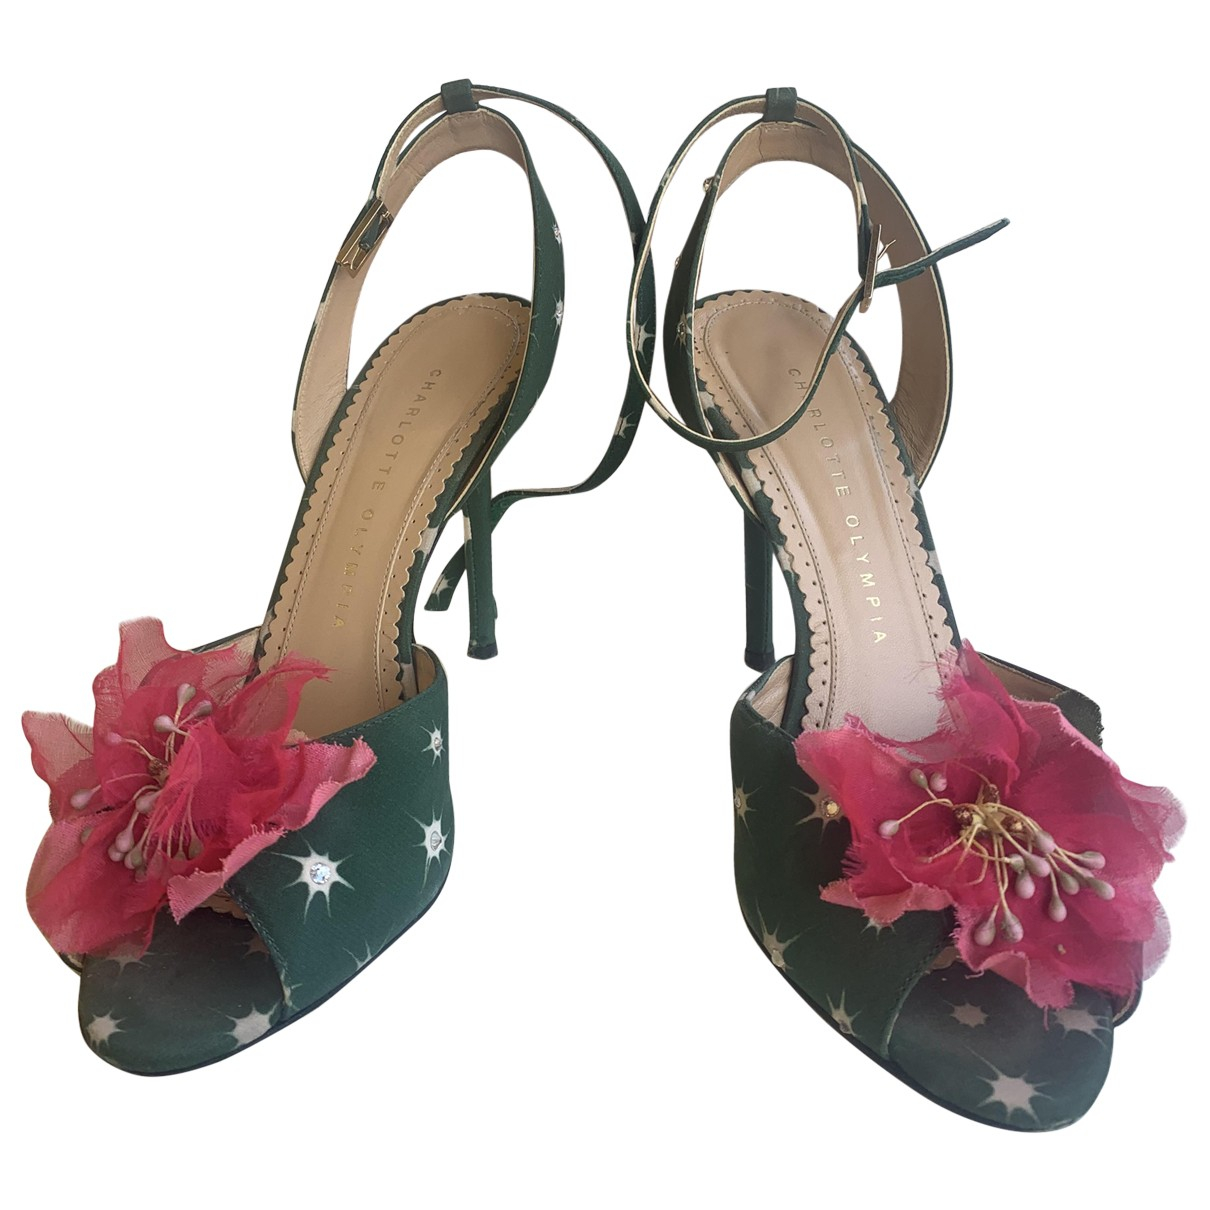 Charlotte Olympia N Green Cloth Heels for Women 37.5 EU